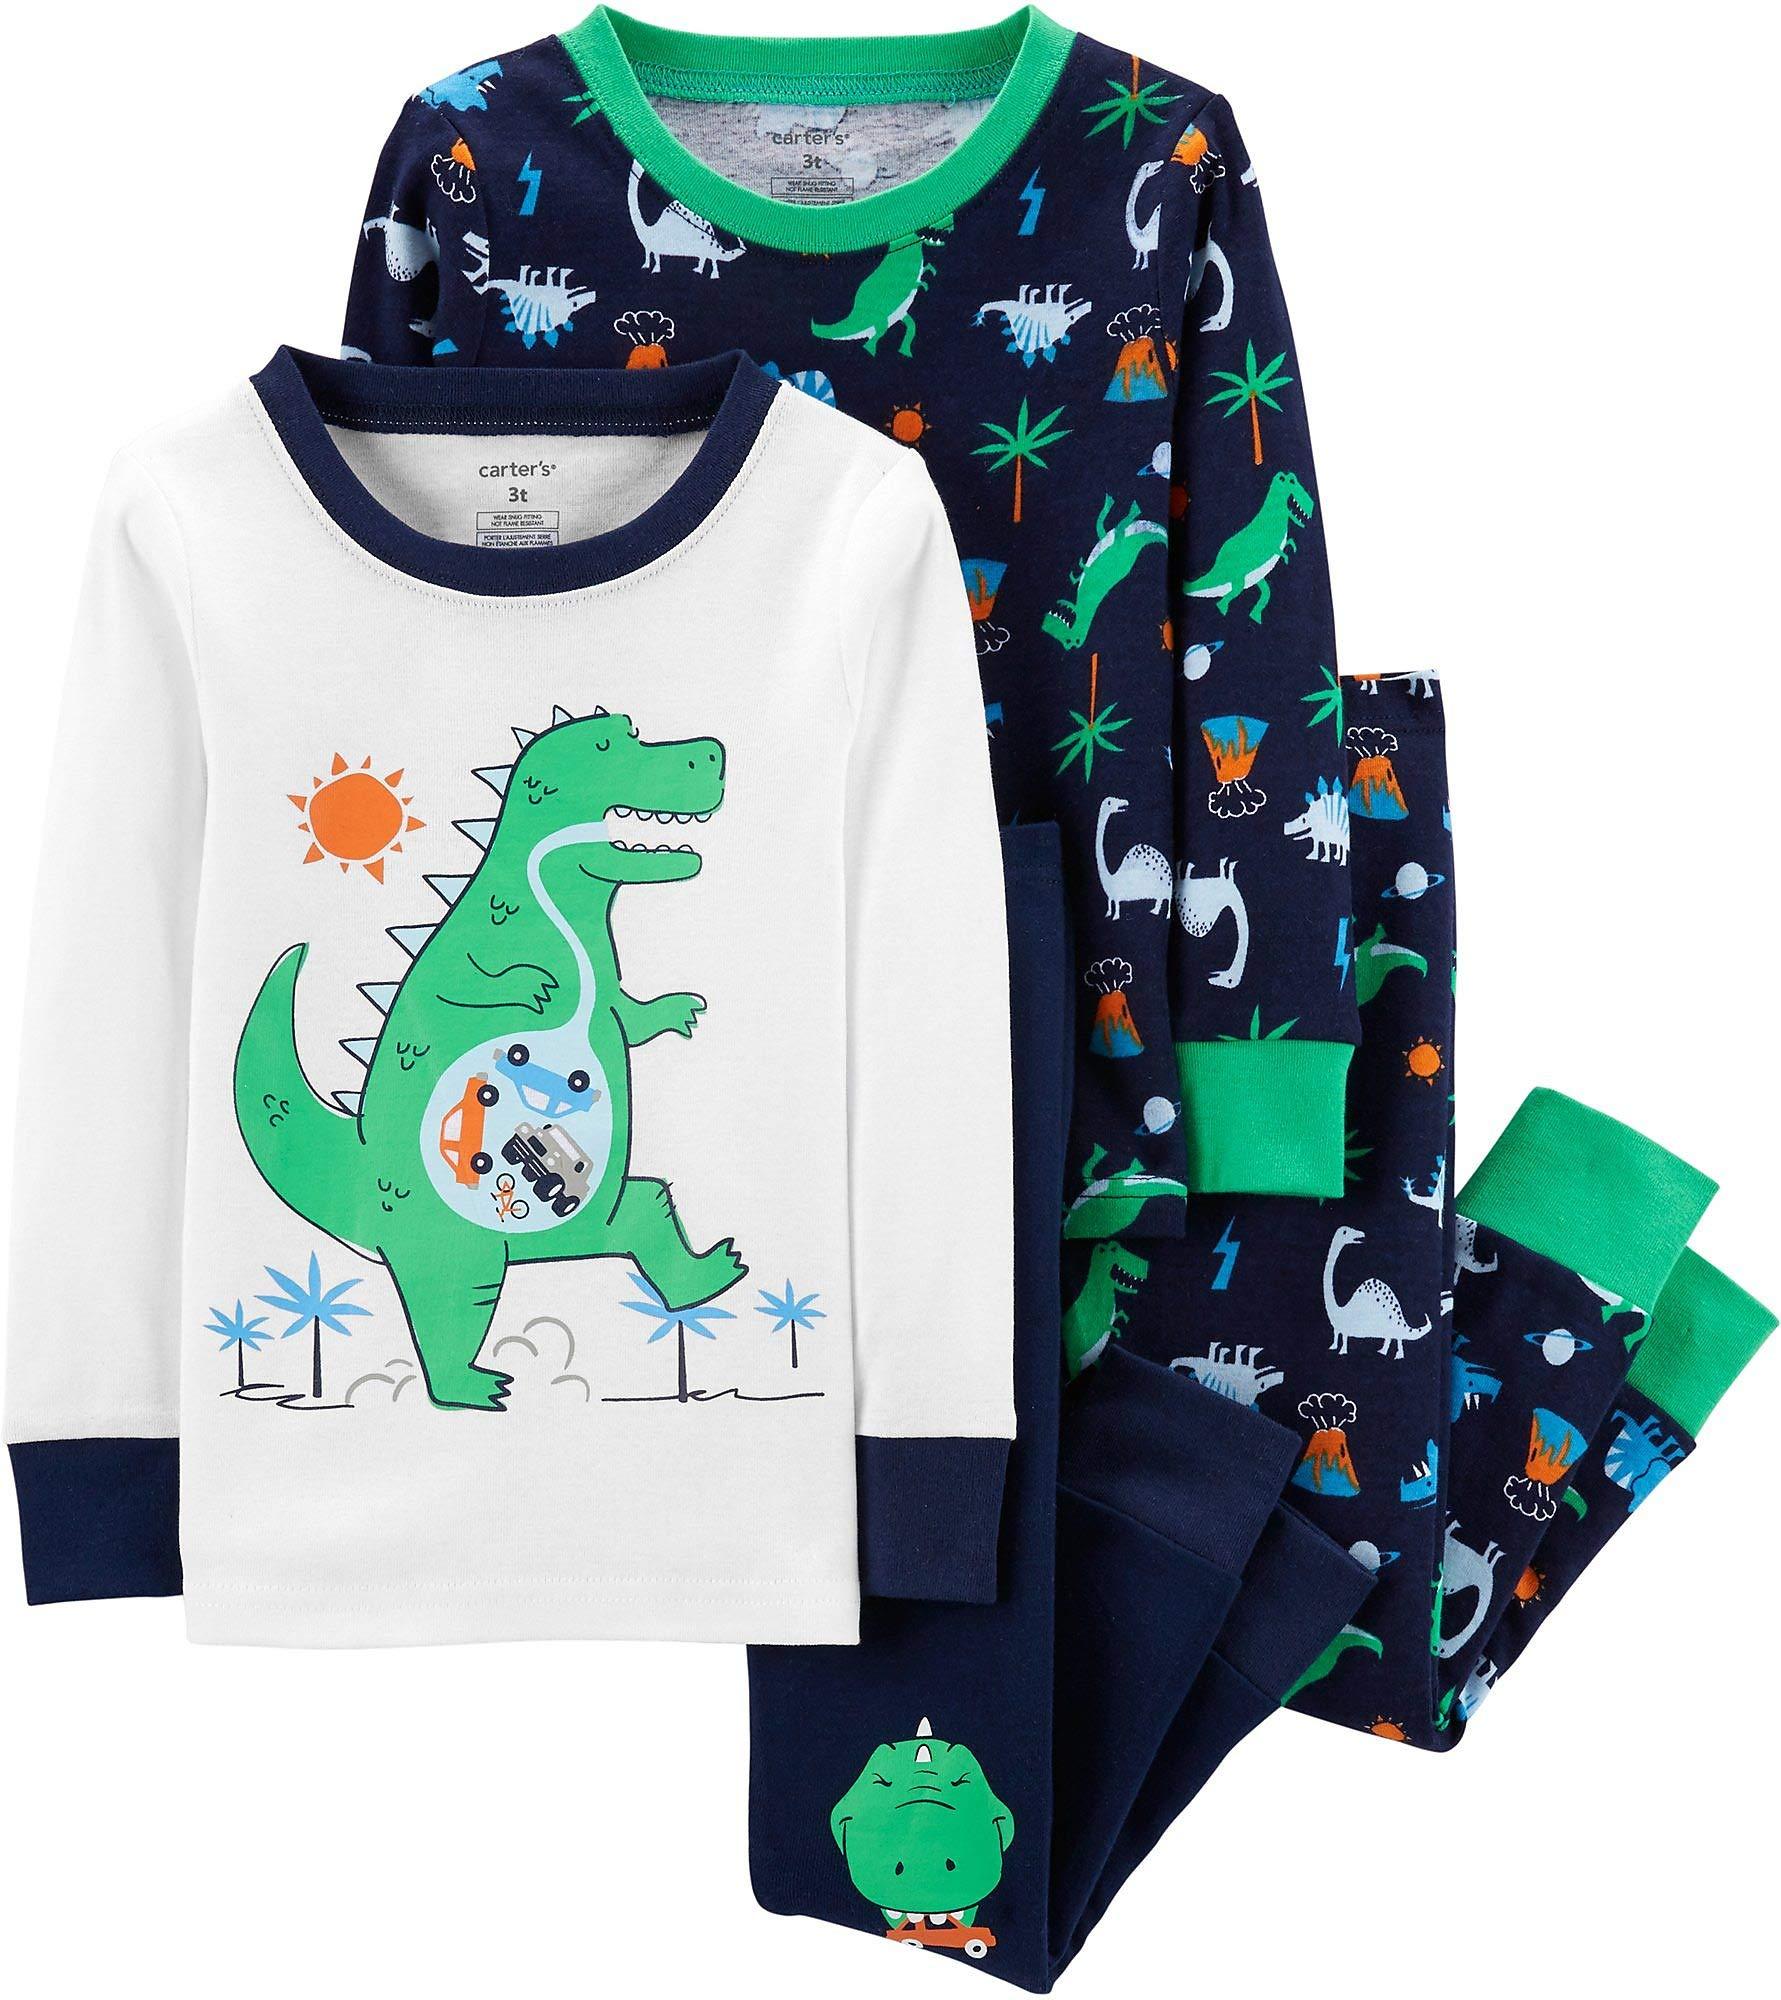 Carter's Boy's 4-Piece Snug Fit Cotton PJ Set, Green Dino, 3T